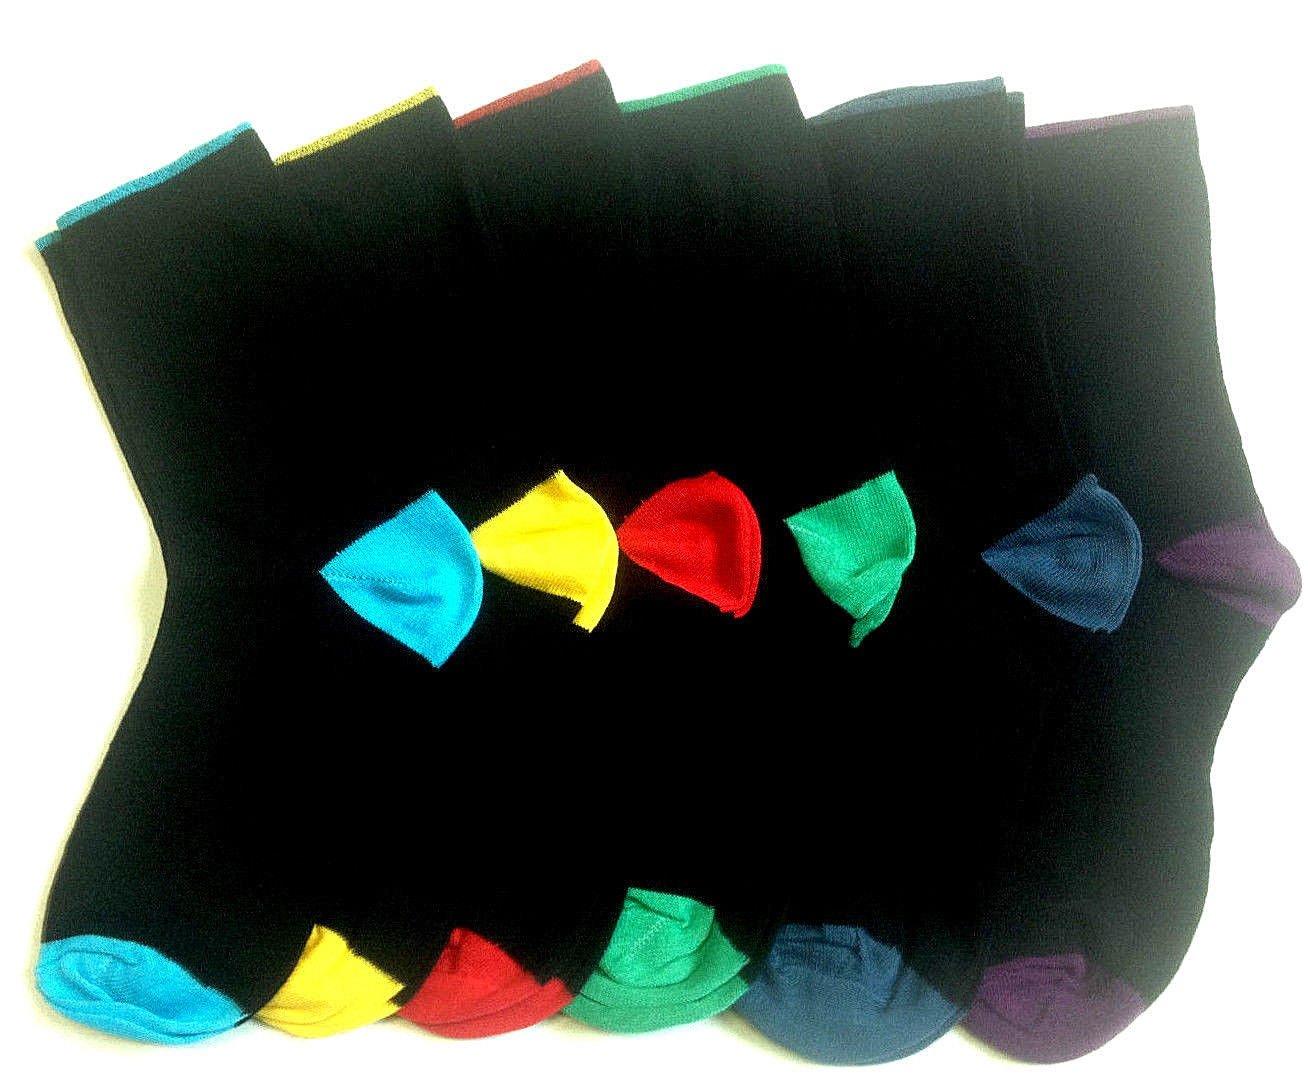 5pairs Boys Black School Socks Designer Heel Toe Foot Multi Colour Design Cotton Blend Socks